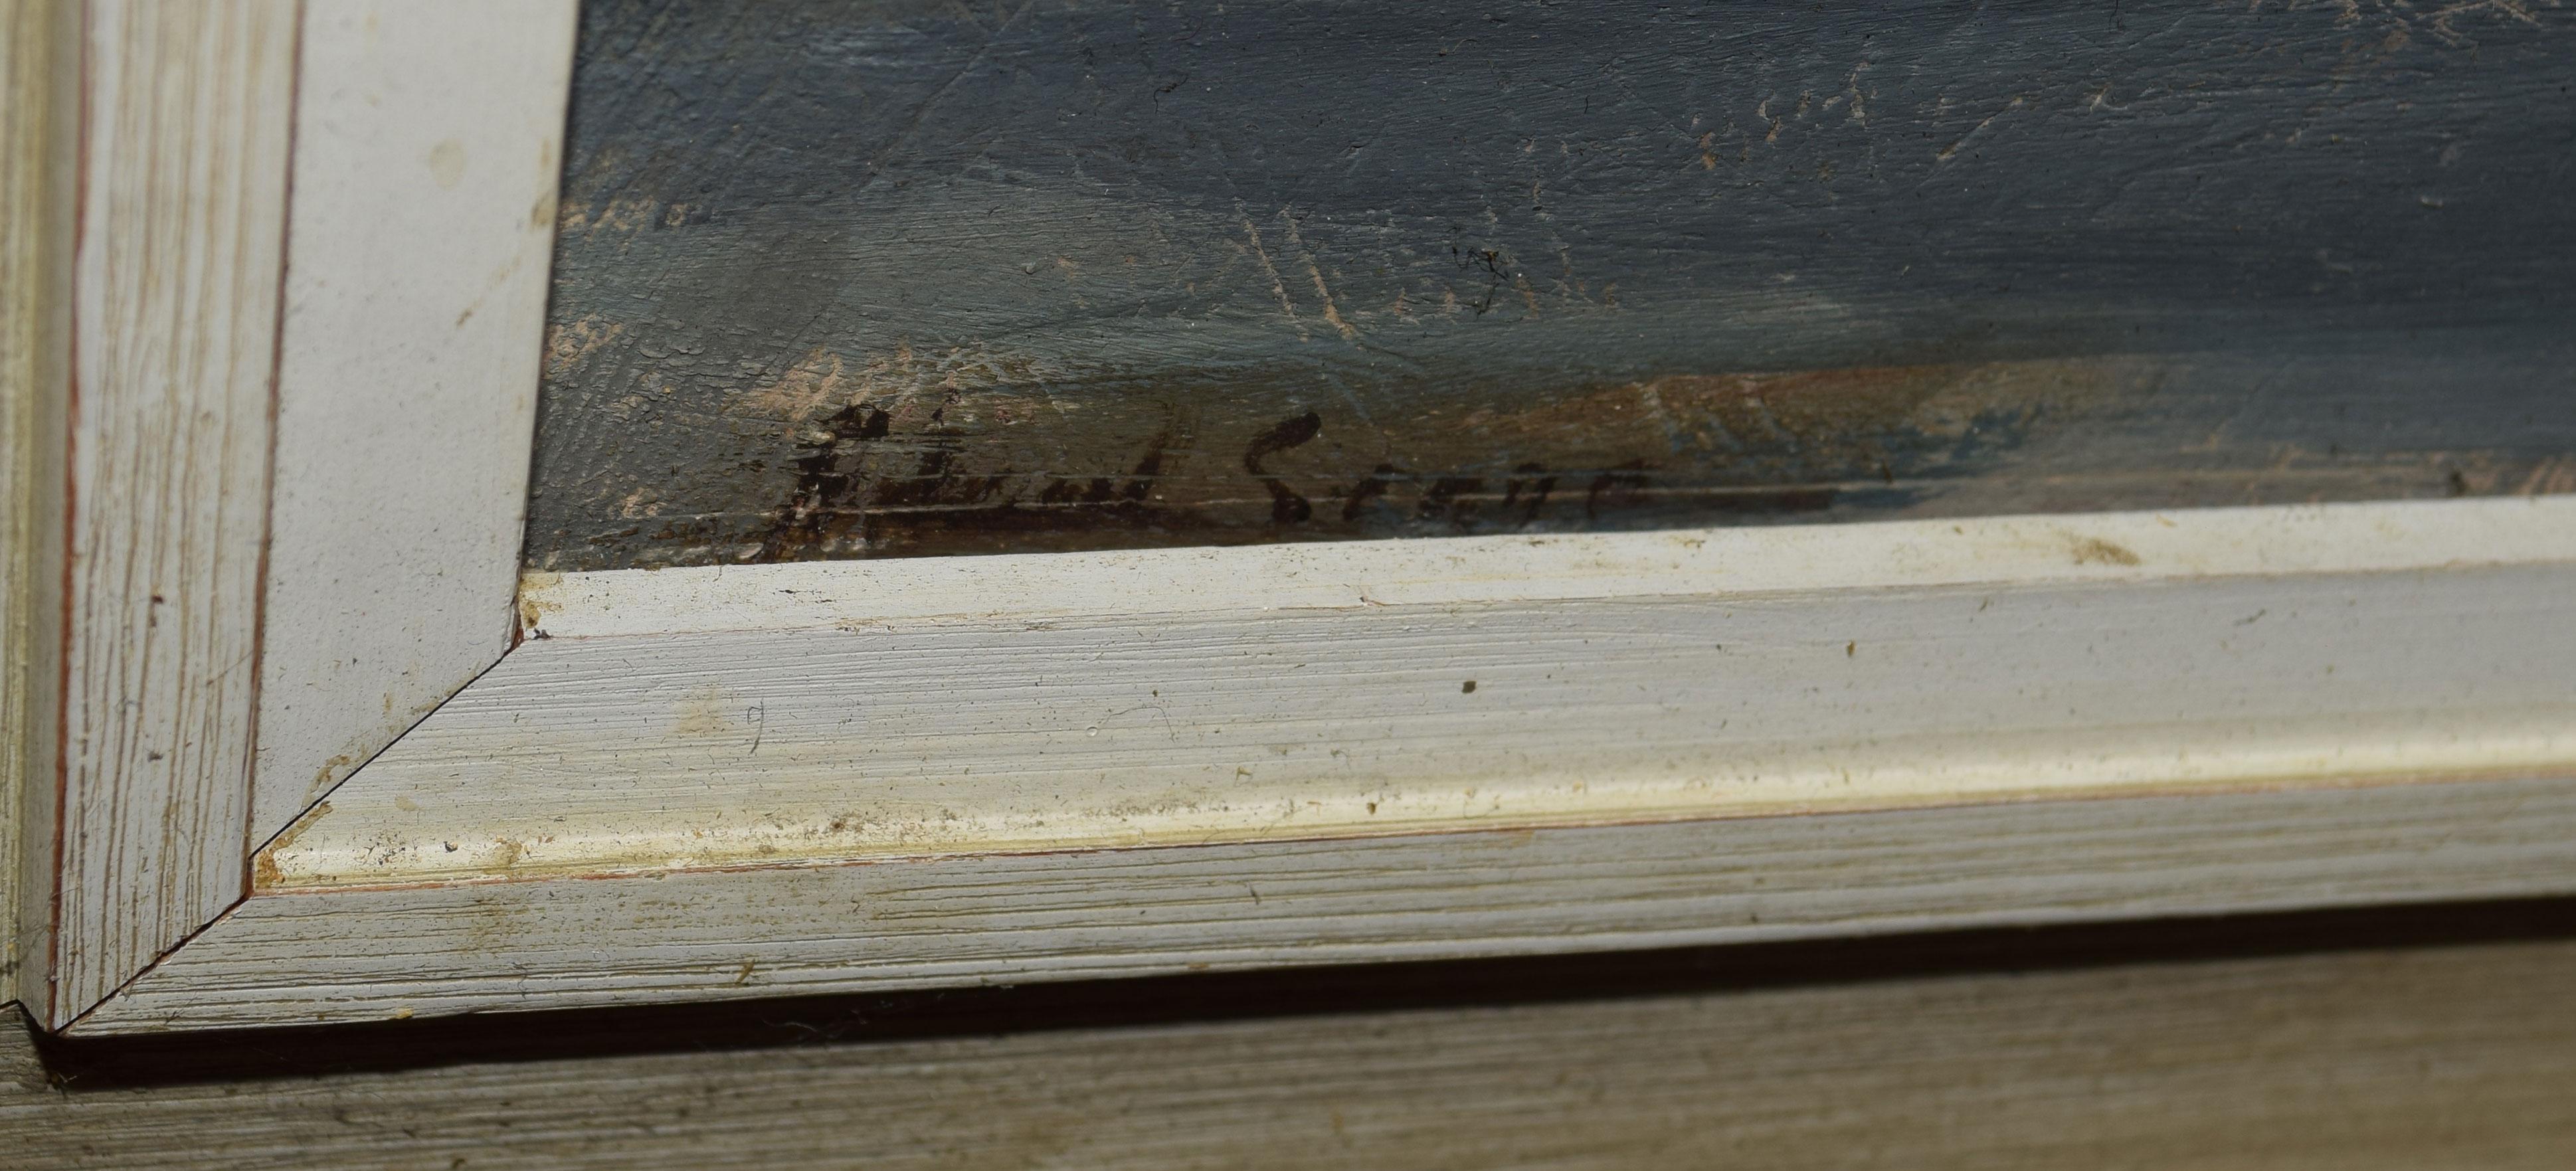 "Follower of Edward Seago, ""Pont Neuf, Paris"", oil on board, bears signature lower left, 36 x 47cm - Image 2 of 2"